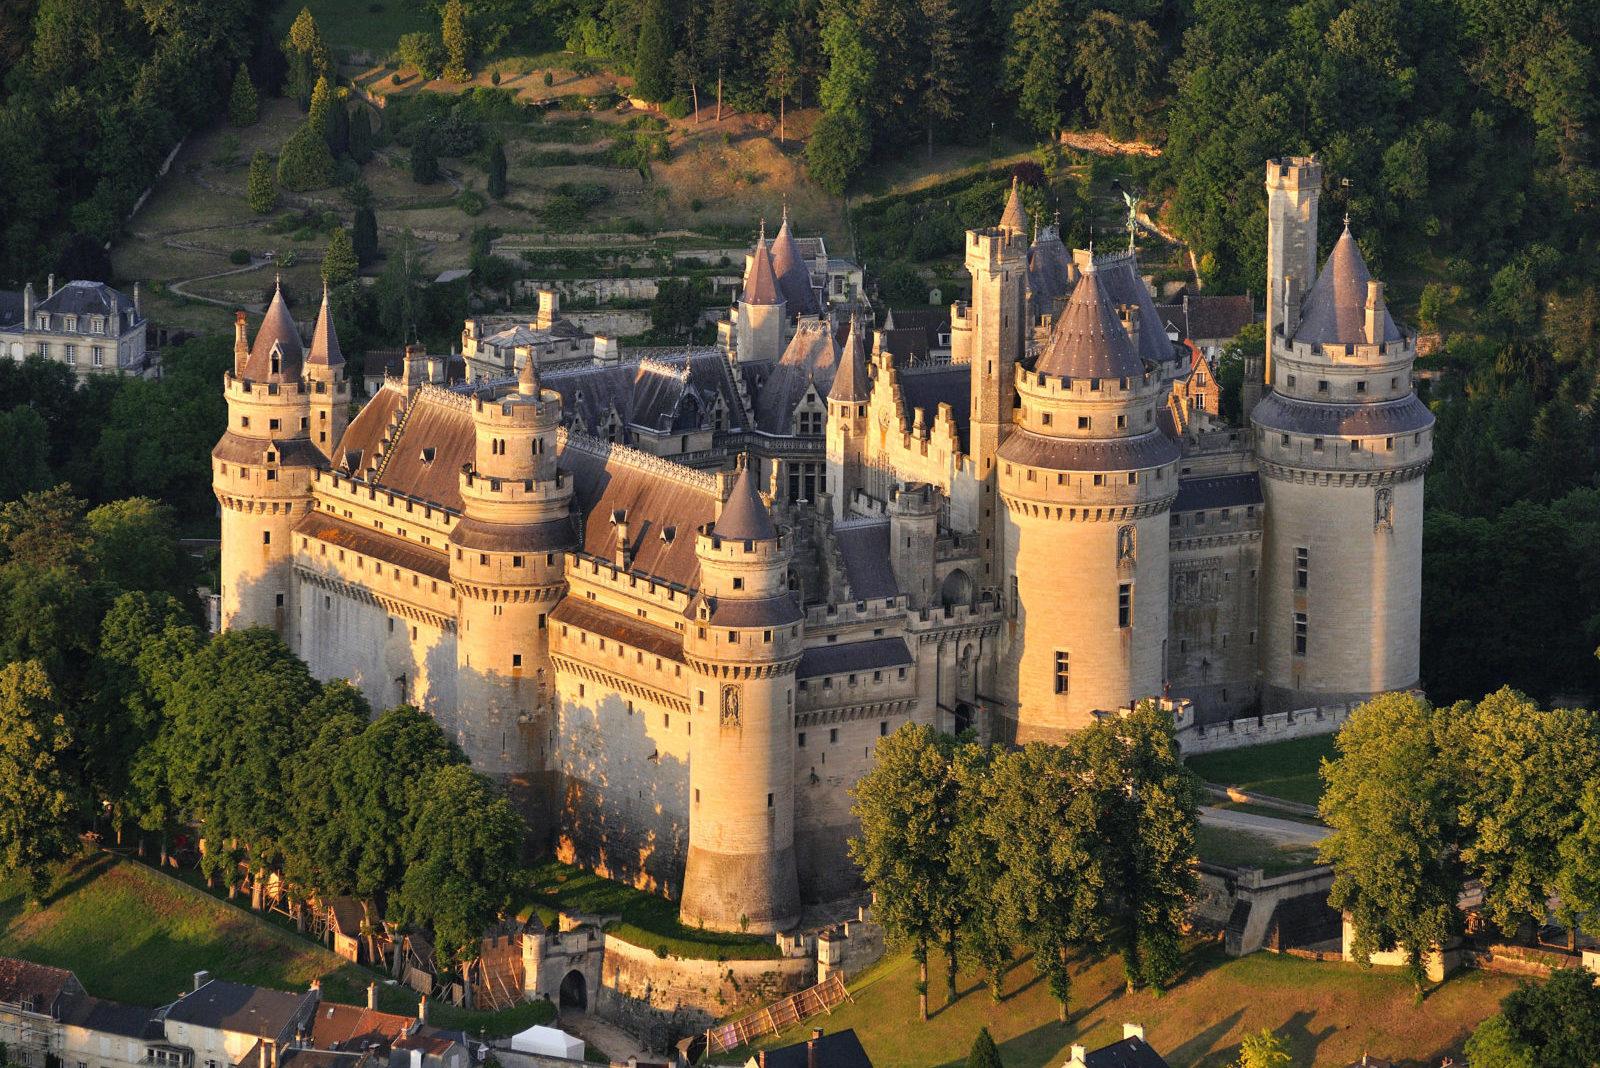 Замок Pierrefond, О-де-Франс